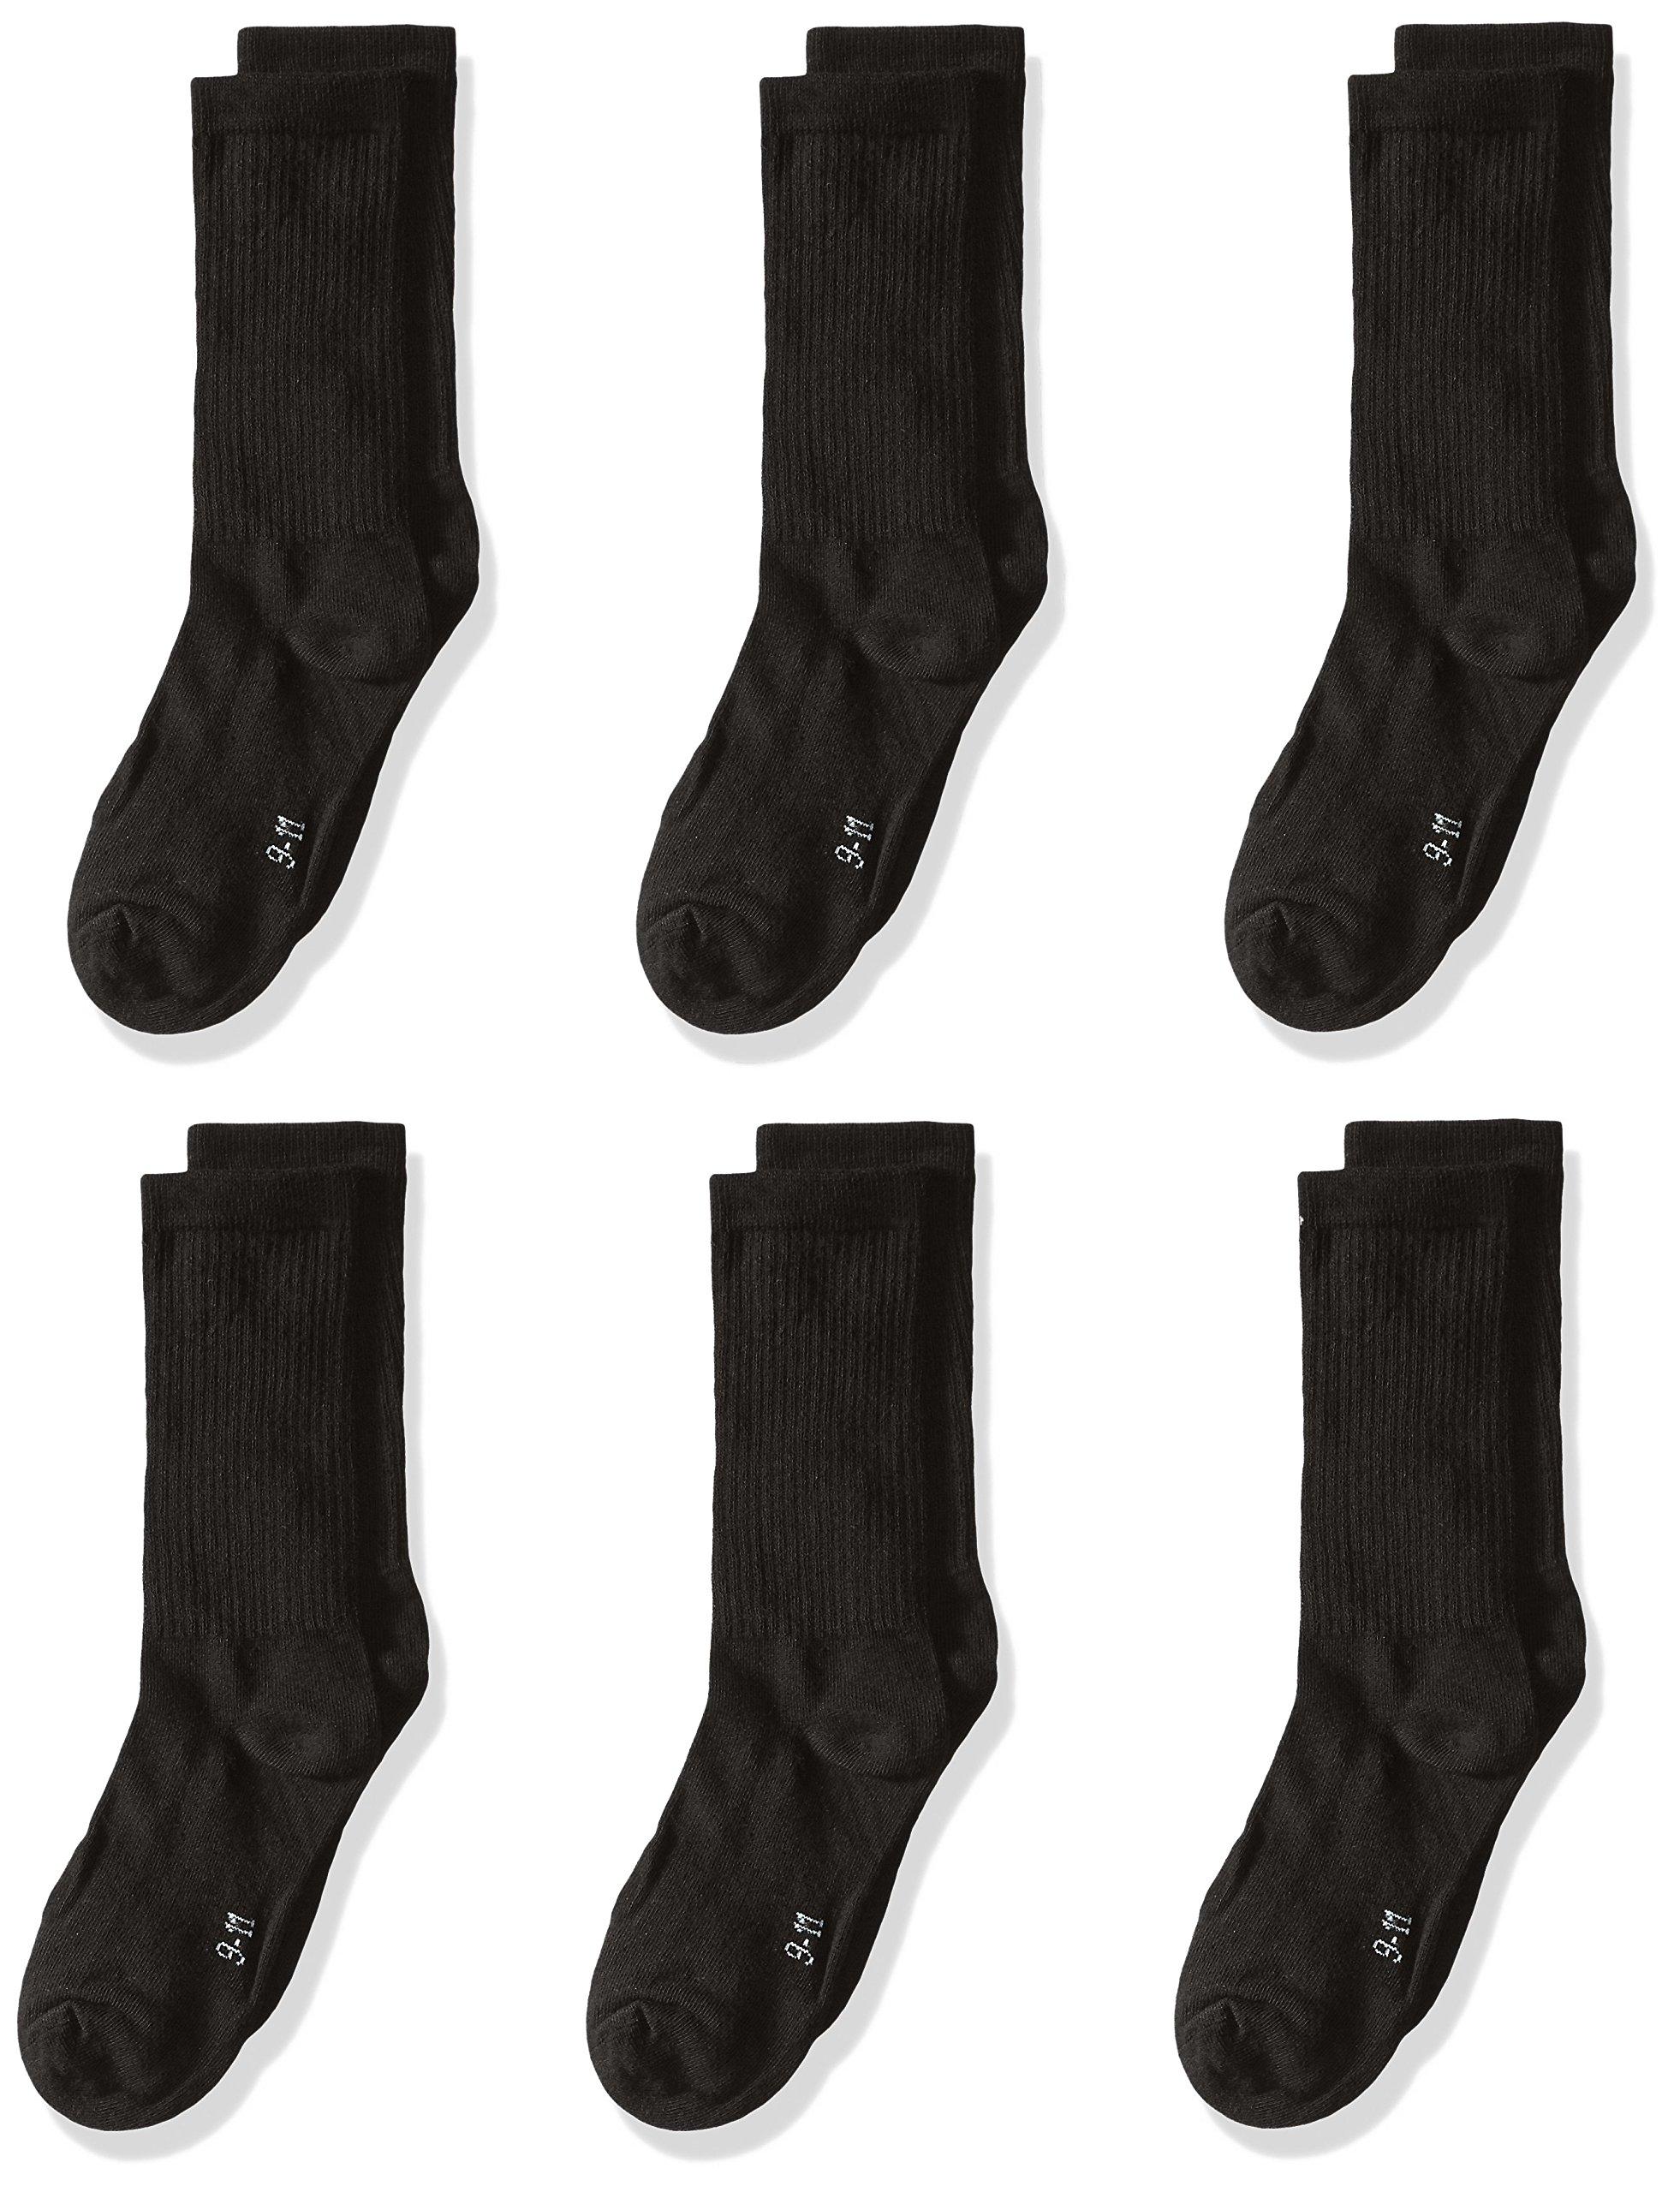 trimfit Big Boys' 6 Pack Cotton Rib Crew Socks (Comfortoe), Black, Large/9-11